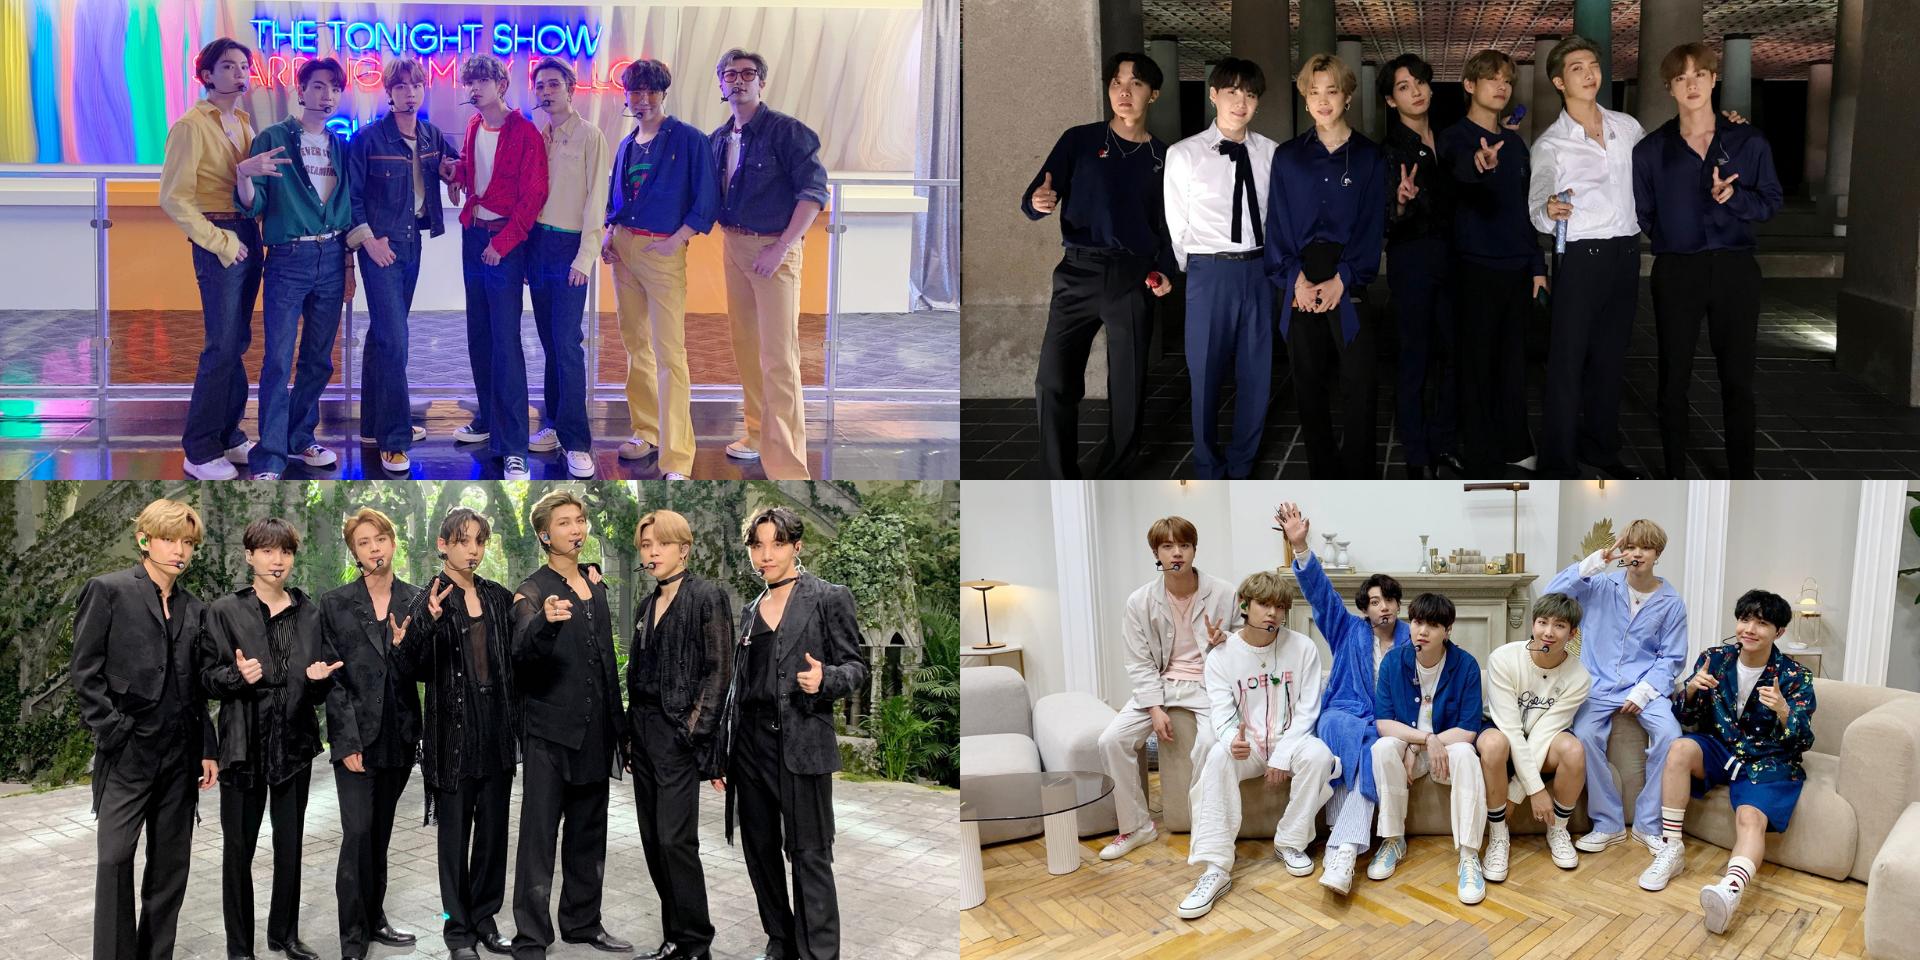 Watch BTS perform 'IDOL', 'HOME, 'Black Swan', 'Mikrokosmos', and 'Dynamite' on BTS Week